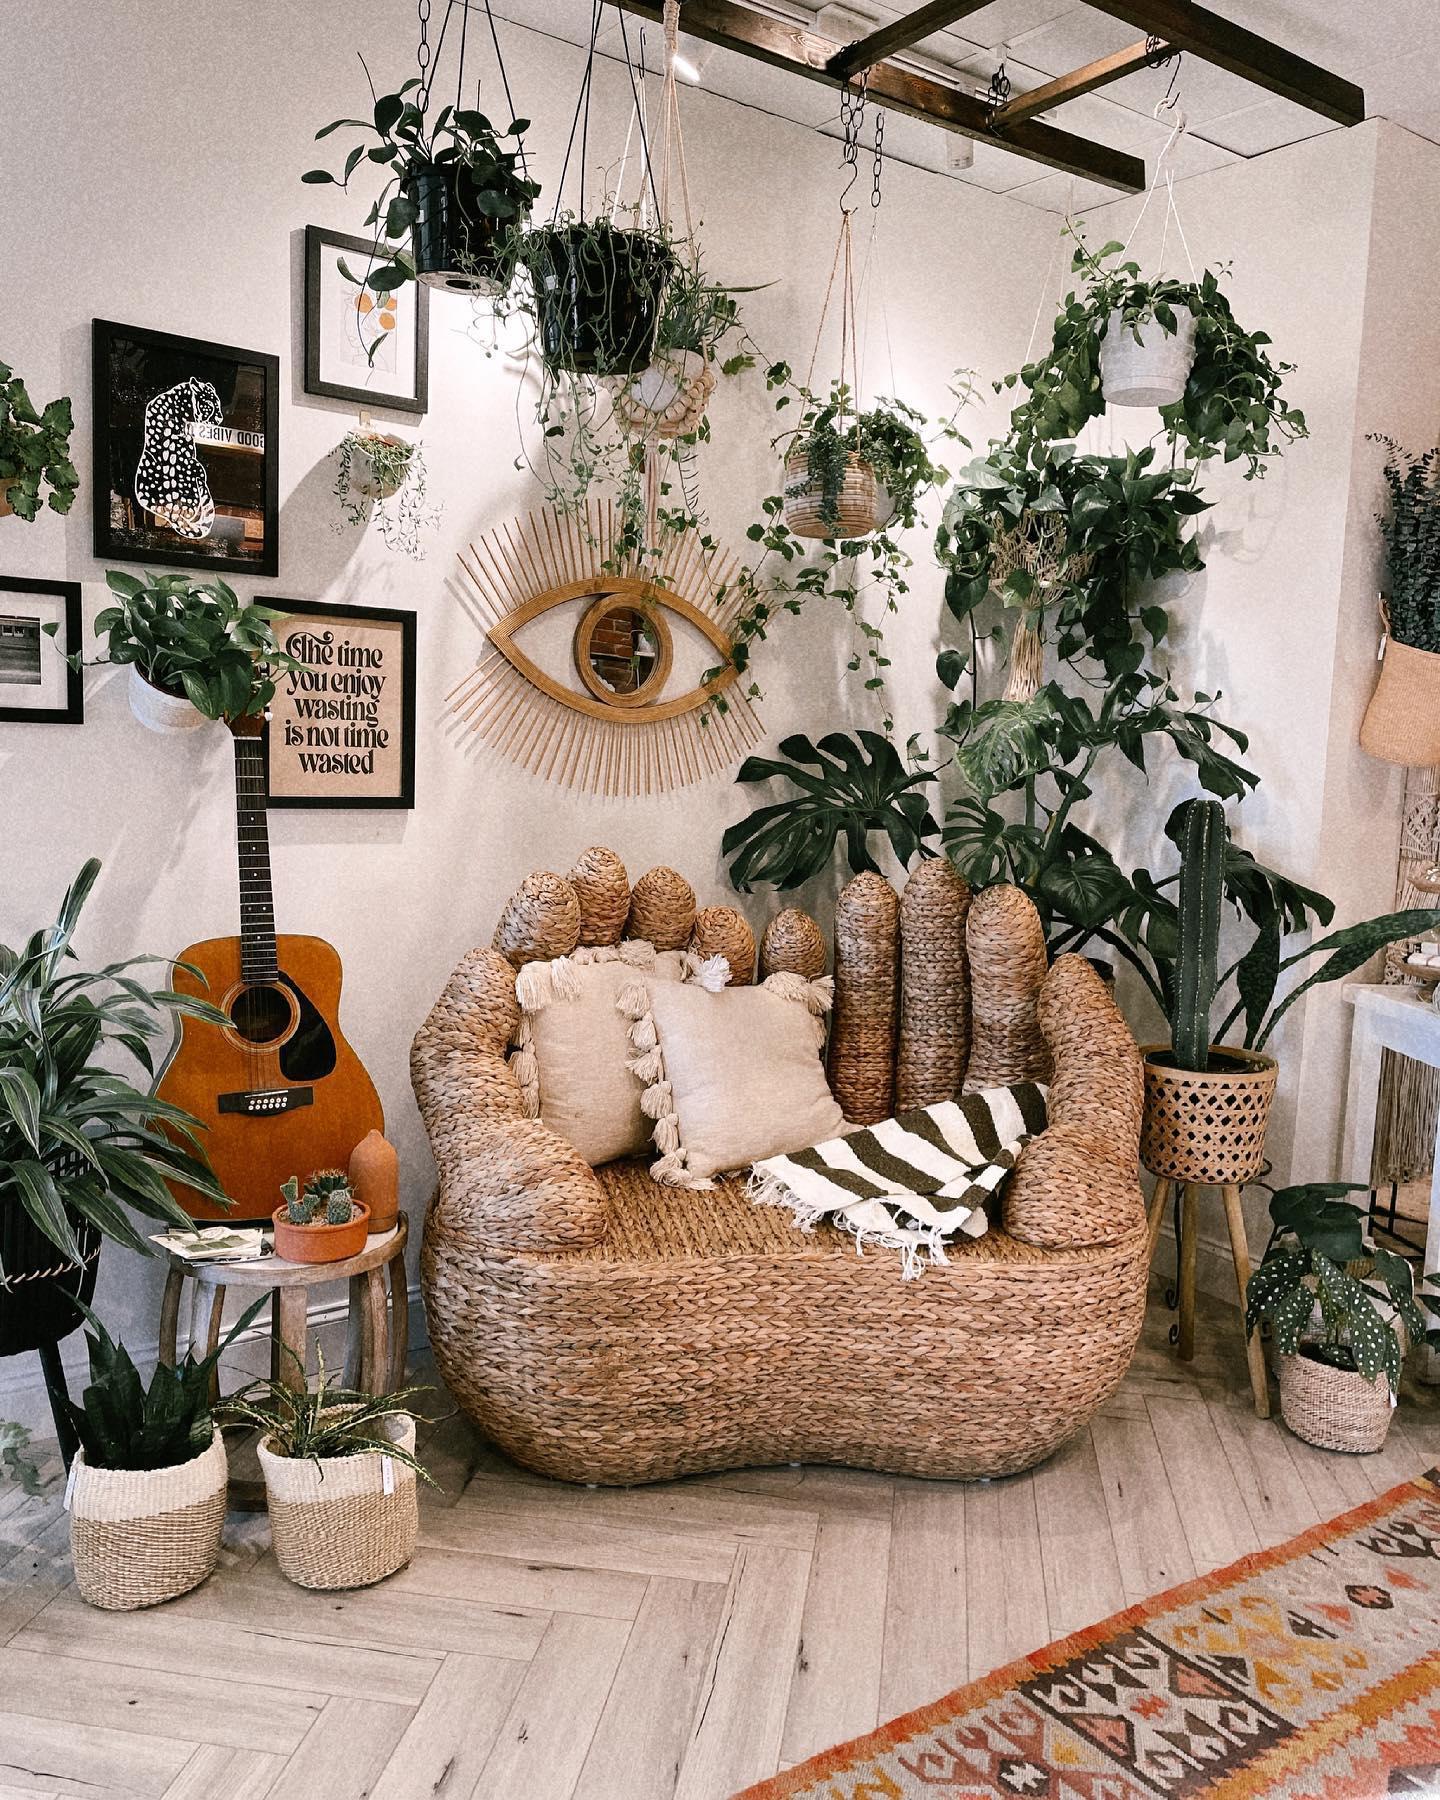 The Terracotta Room